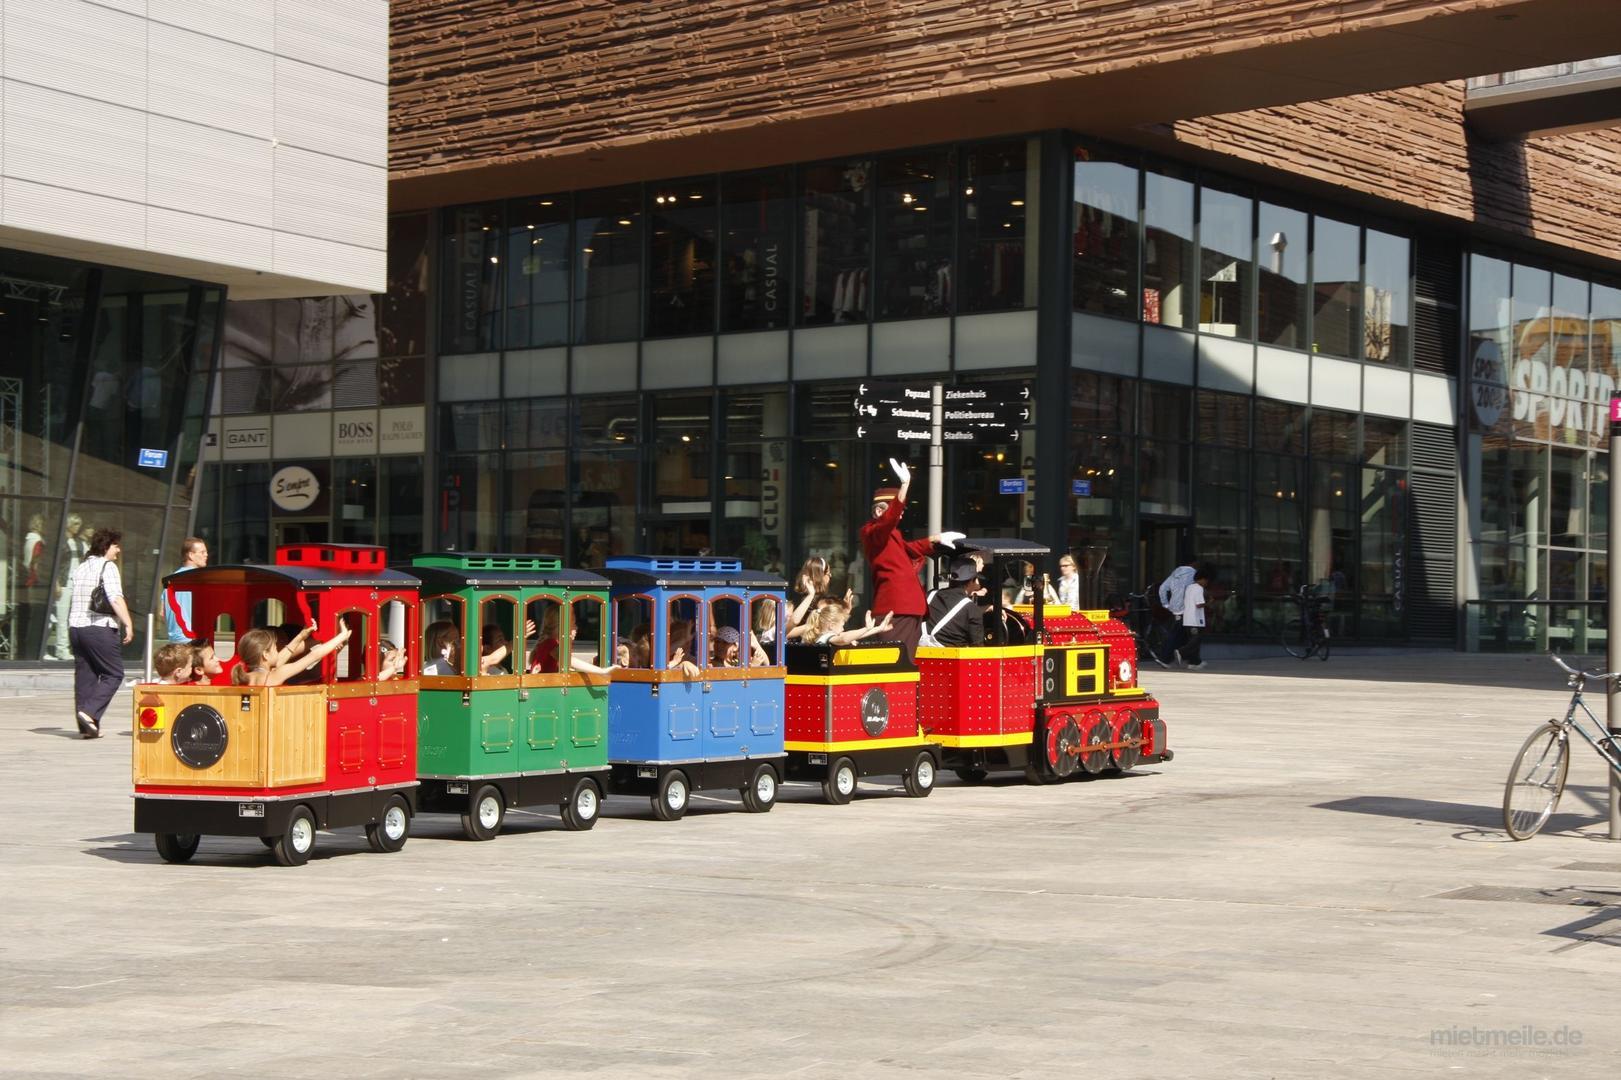 Eisenbahn mieten & vermieten - Eisenbahn ~ Wattmann Maxi Express  in Rheinmünster